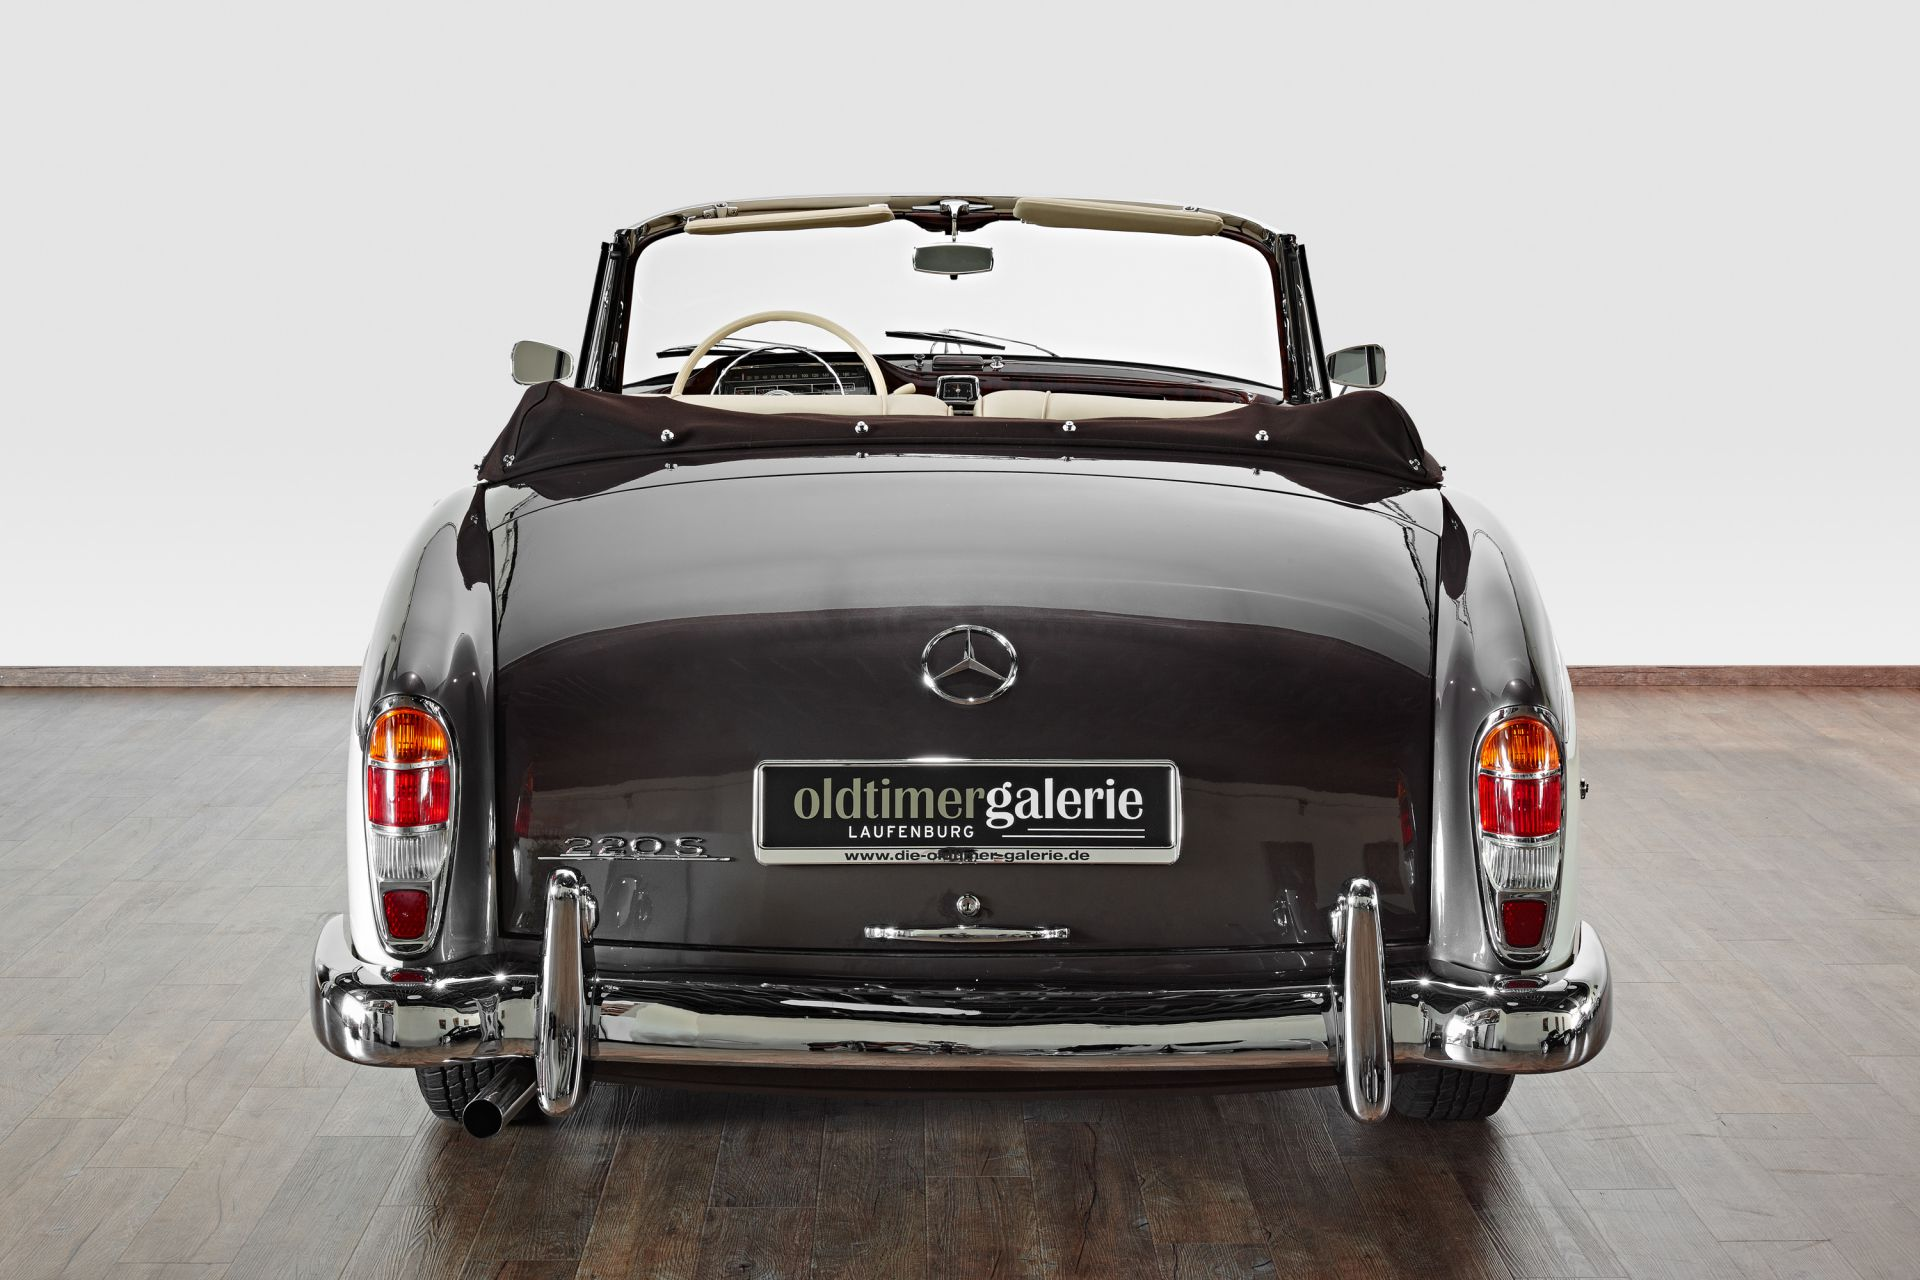 1958 Mercedes 220 S Cabriolet Ponton